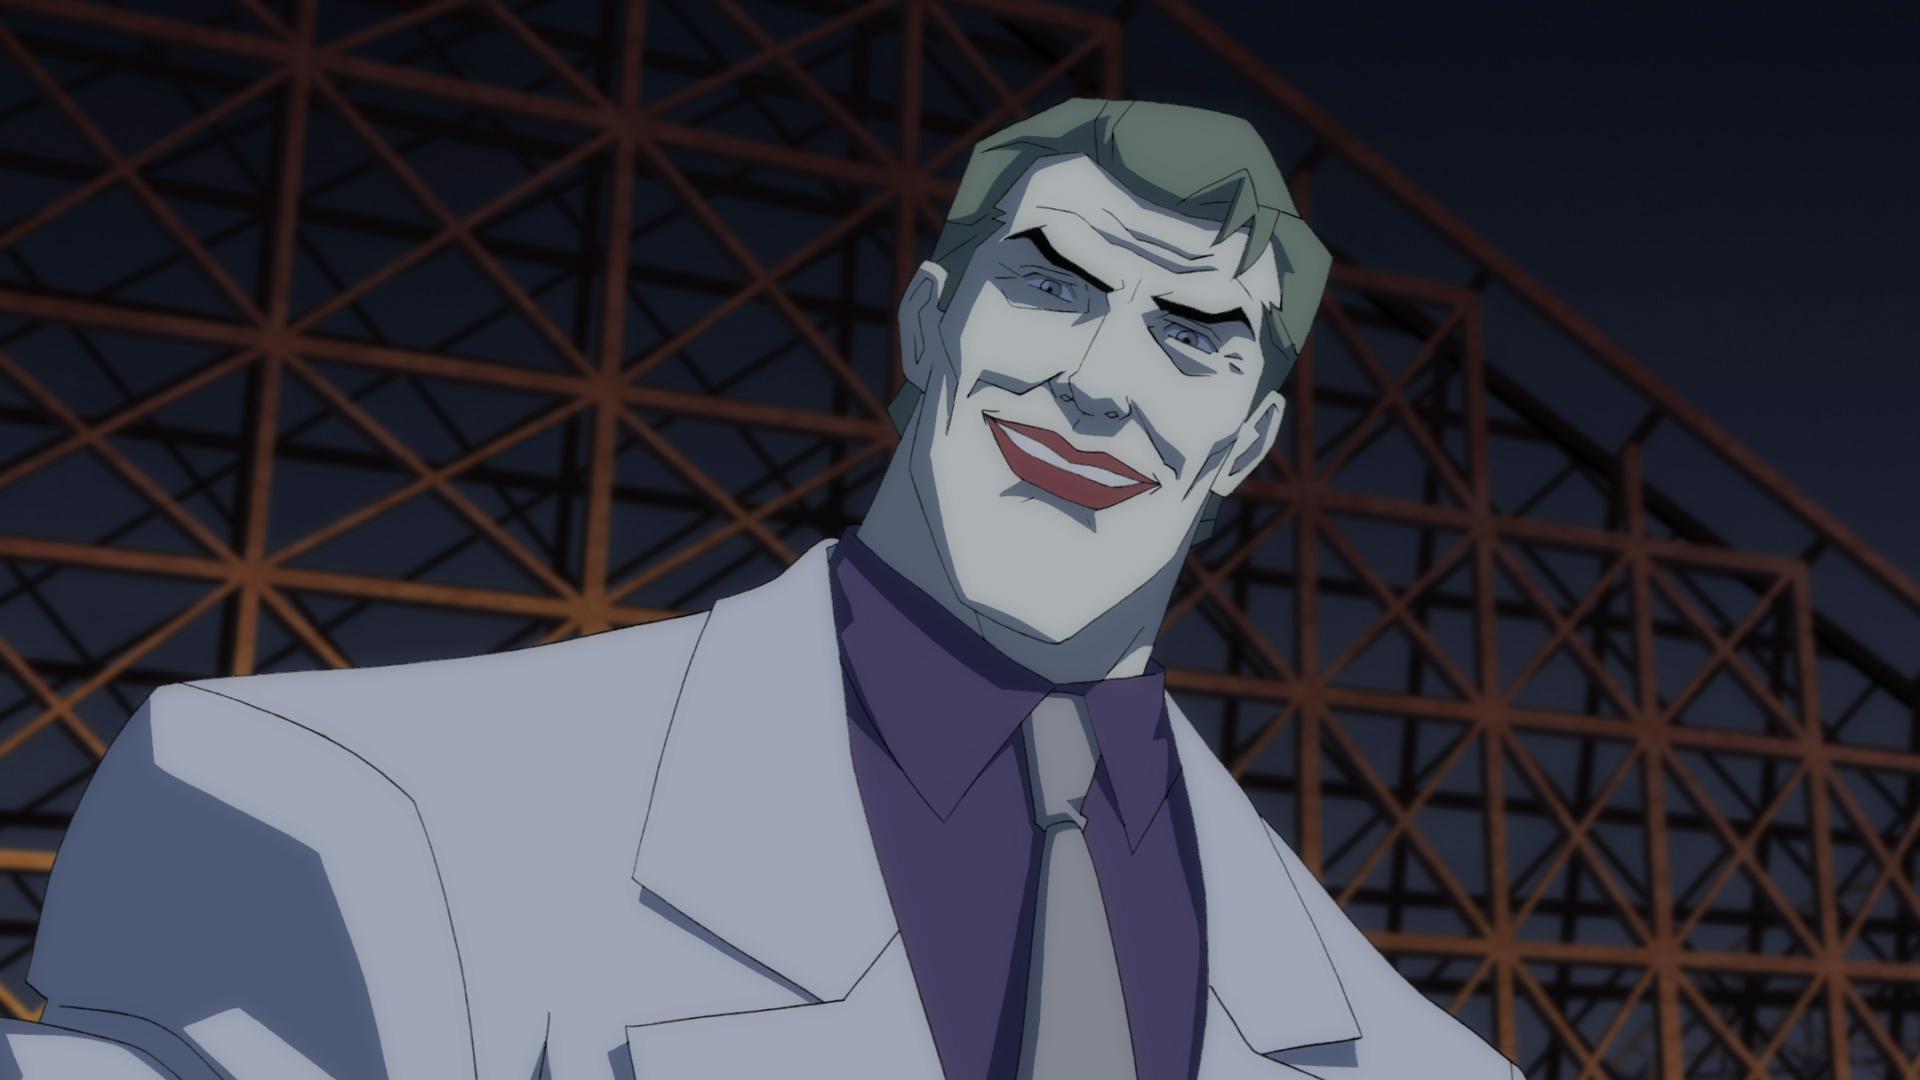 Jared Leto Quote Wallpaper Batman Dark Knight Returns Animated Movie Why Is Joker So